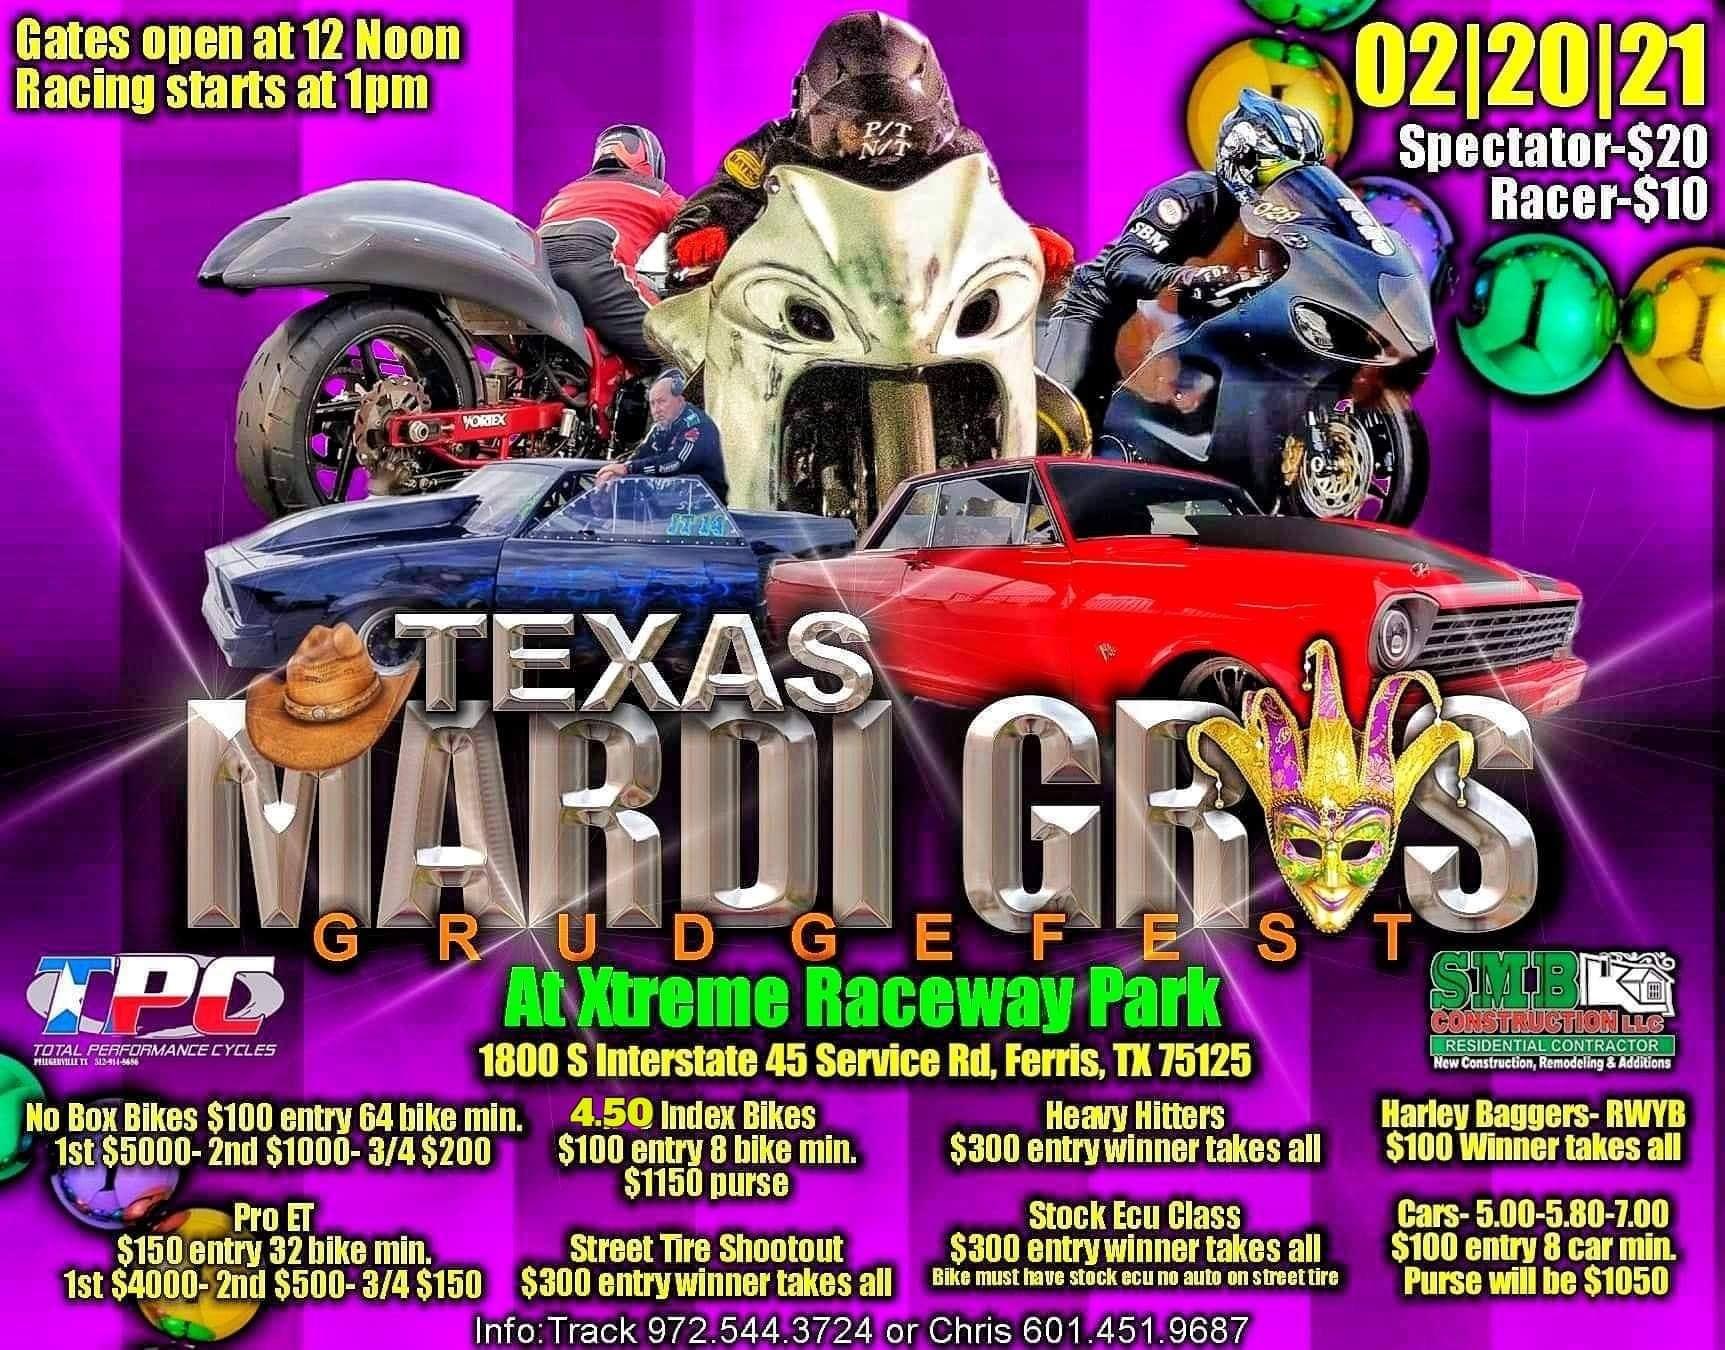 Texas Mardi Gras Grudgefest